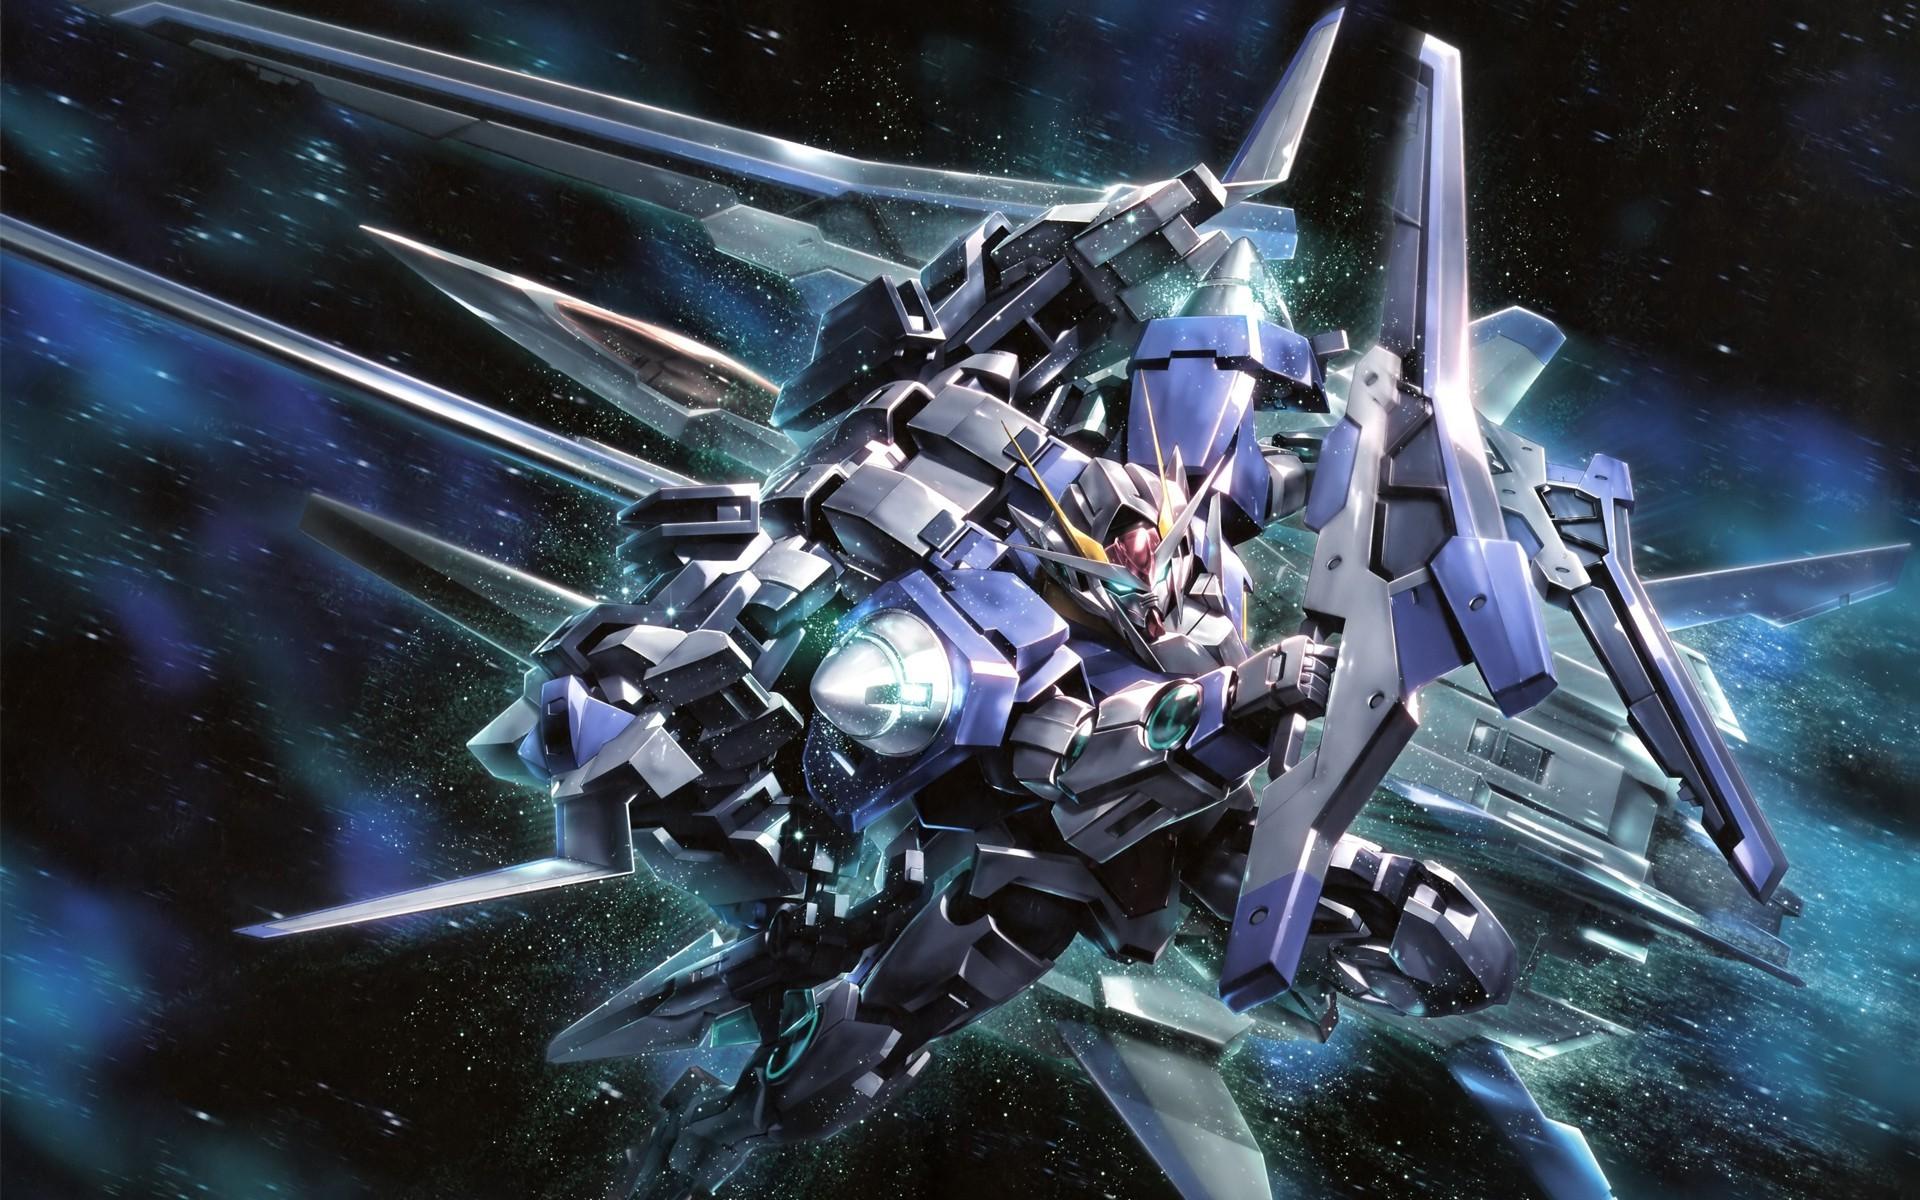 Mobile Suit Gundam 00, Anime, Space, Gundam, Mech, Robot Wallpapers HD /  Desktop and Mobile Backgrounds